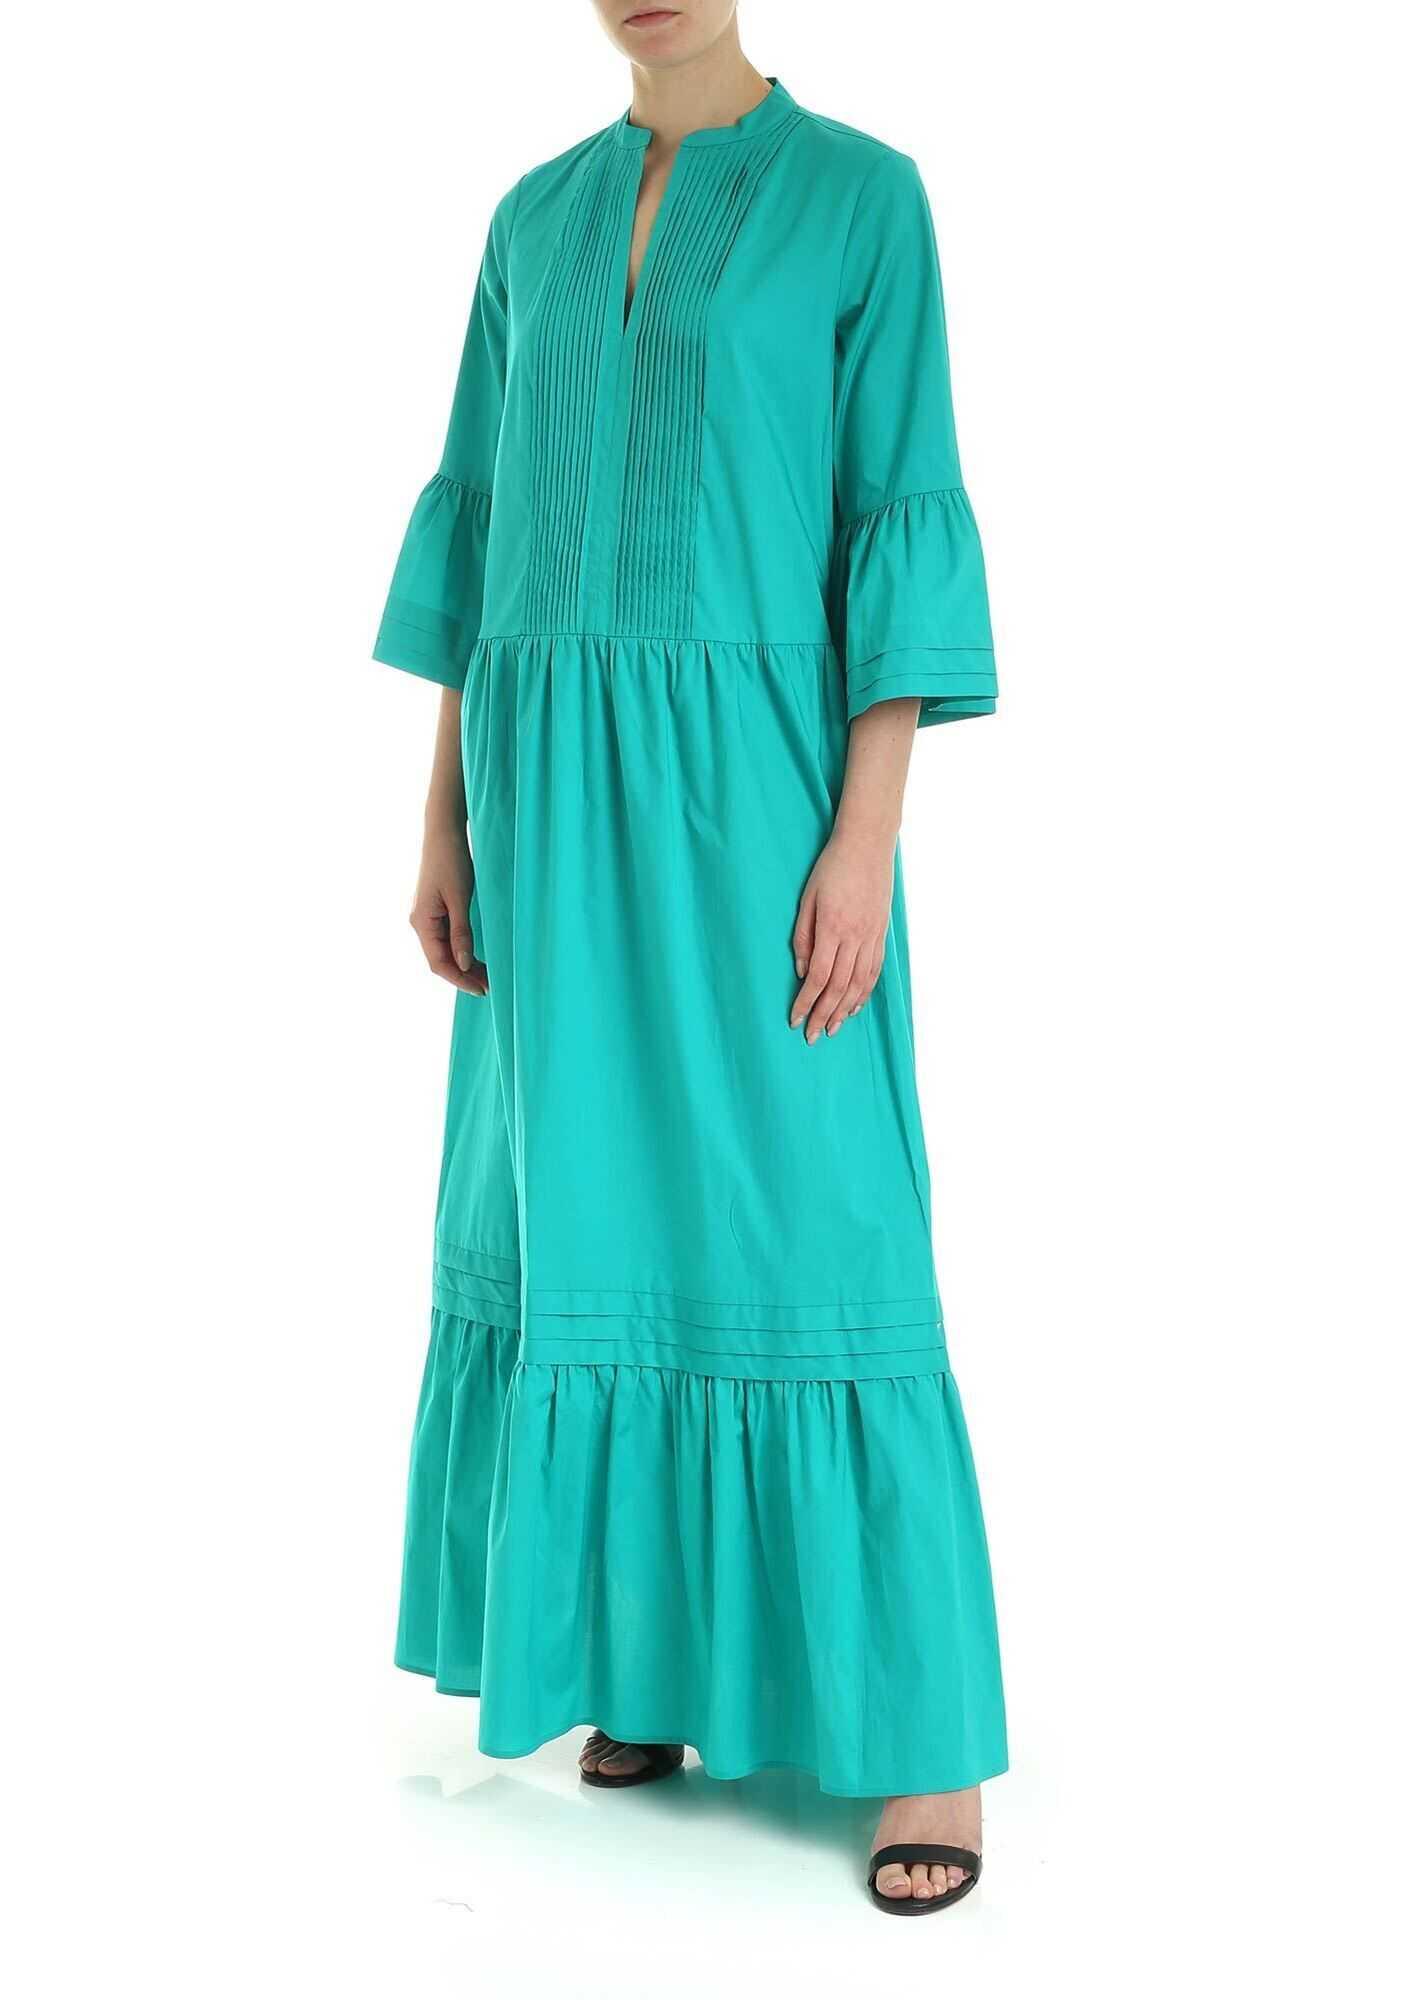 Twin-set Simona Barbieri Plastron Dress In Green Green